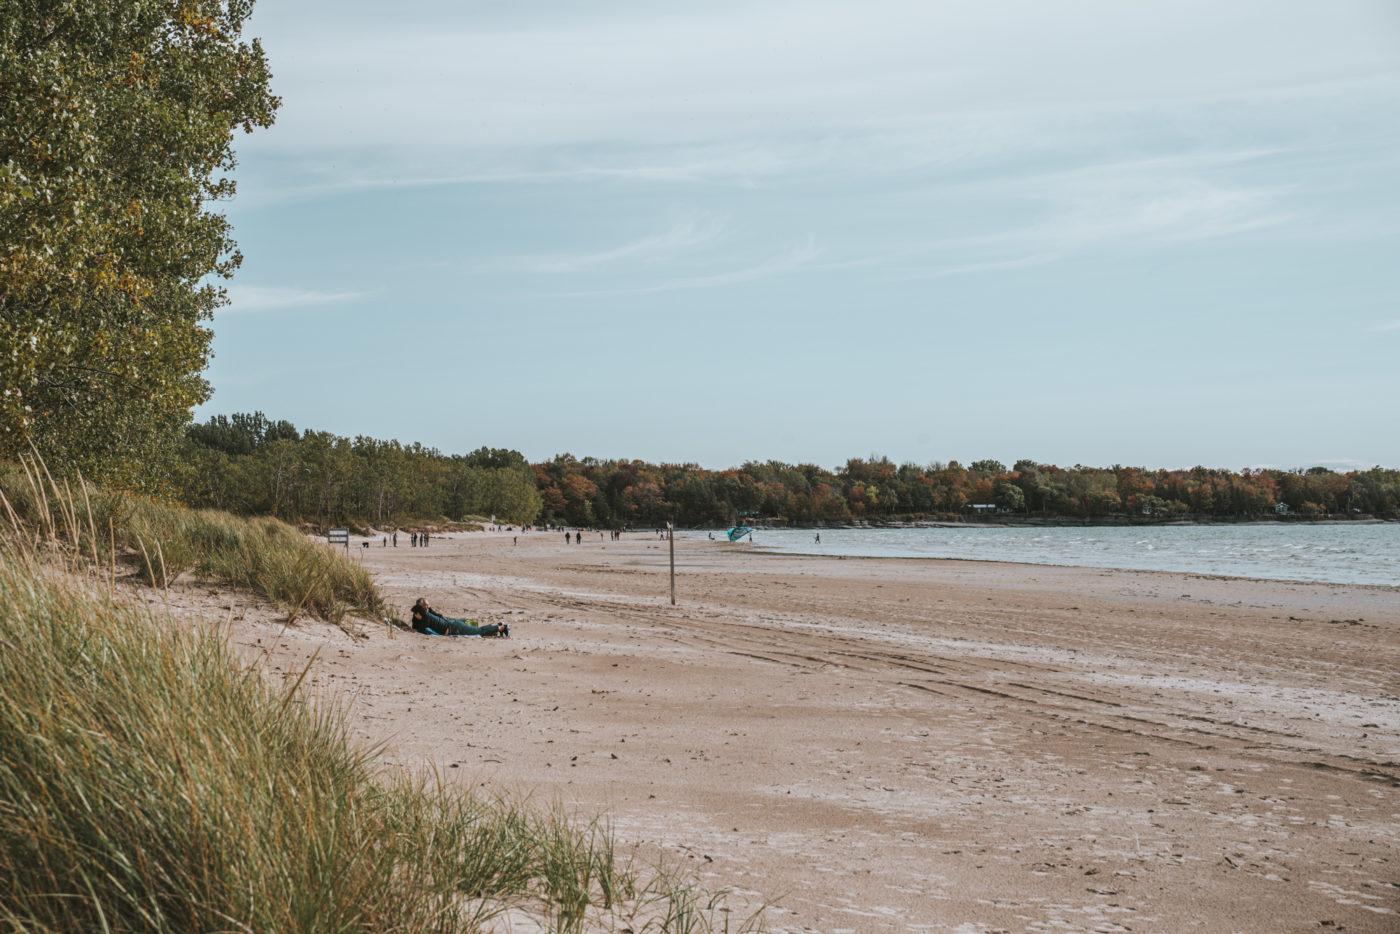 Sandbanks Beach in the fall, Prince Edward County